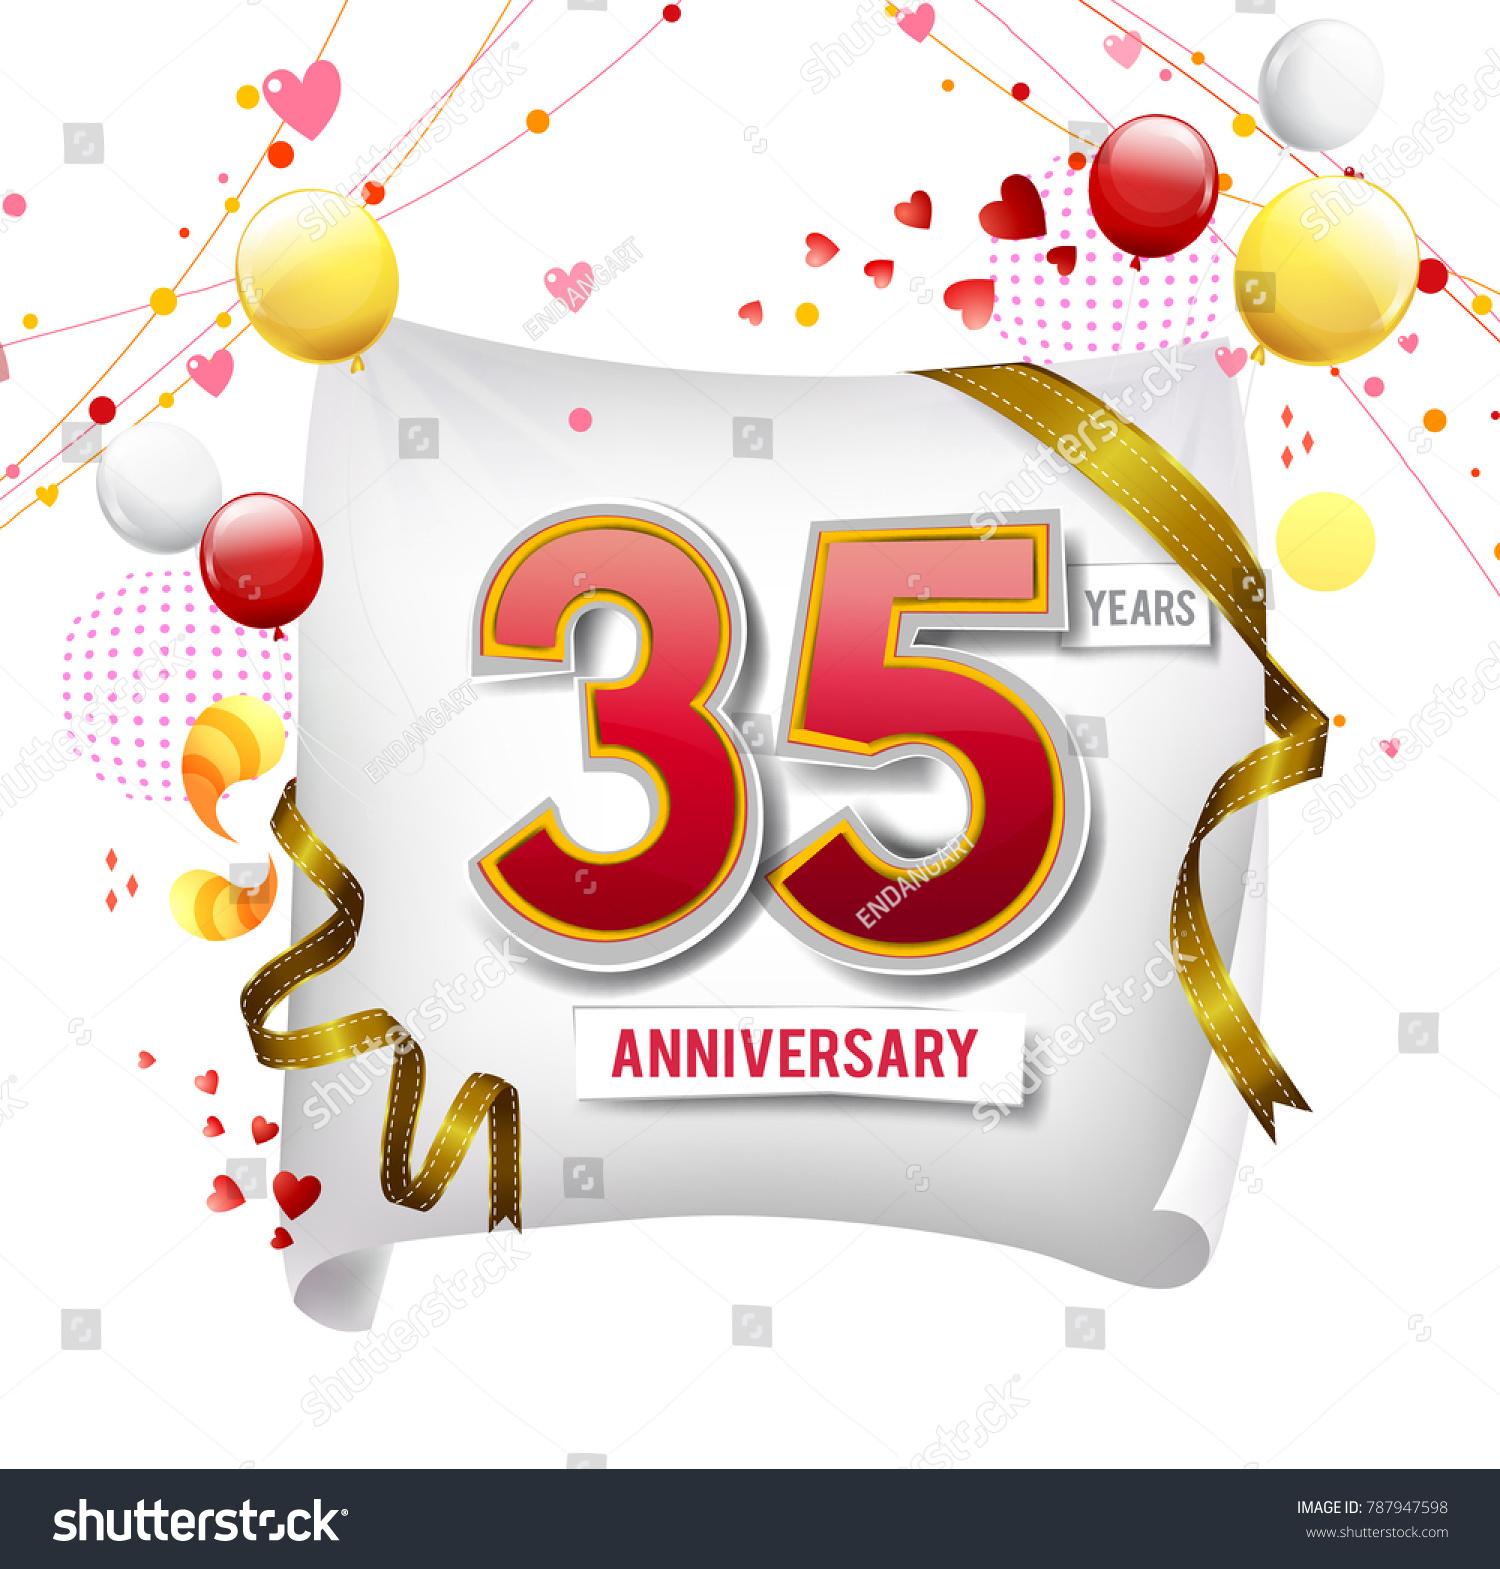 35 Years Anniversary Vector Illustration Banner Stock Vector